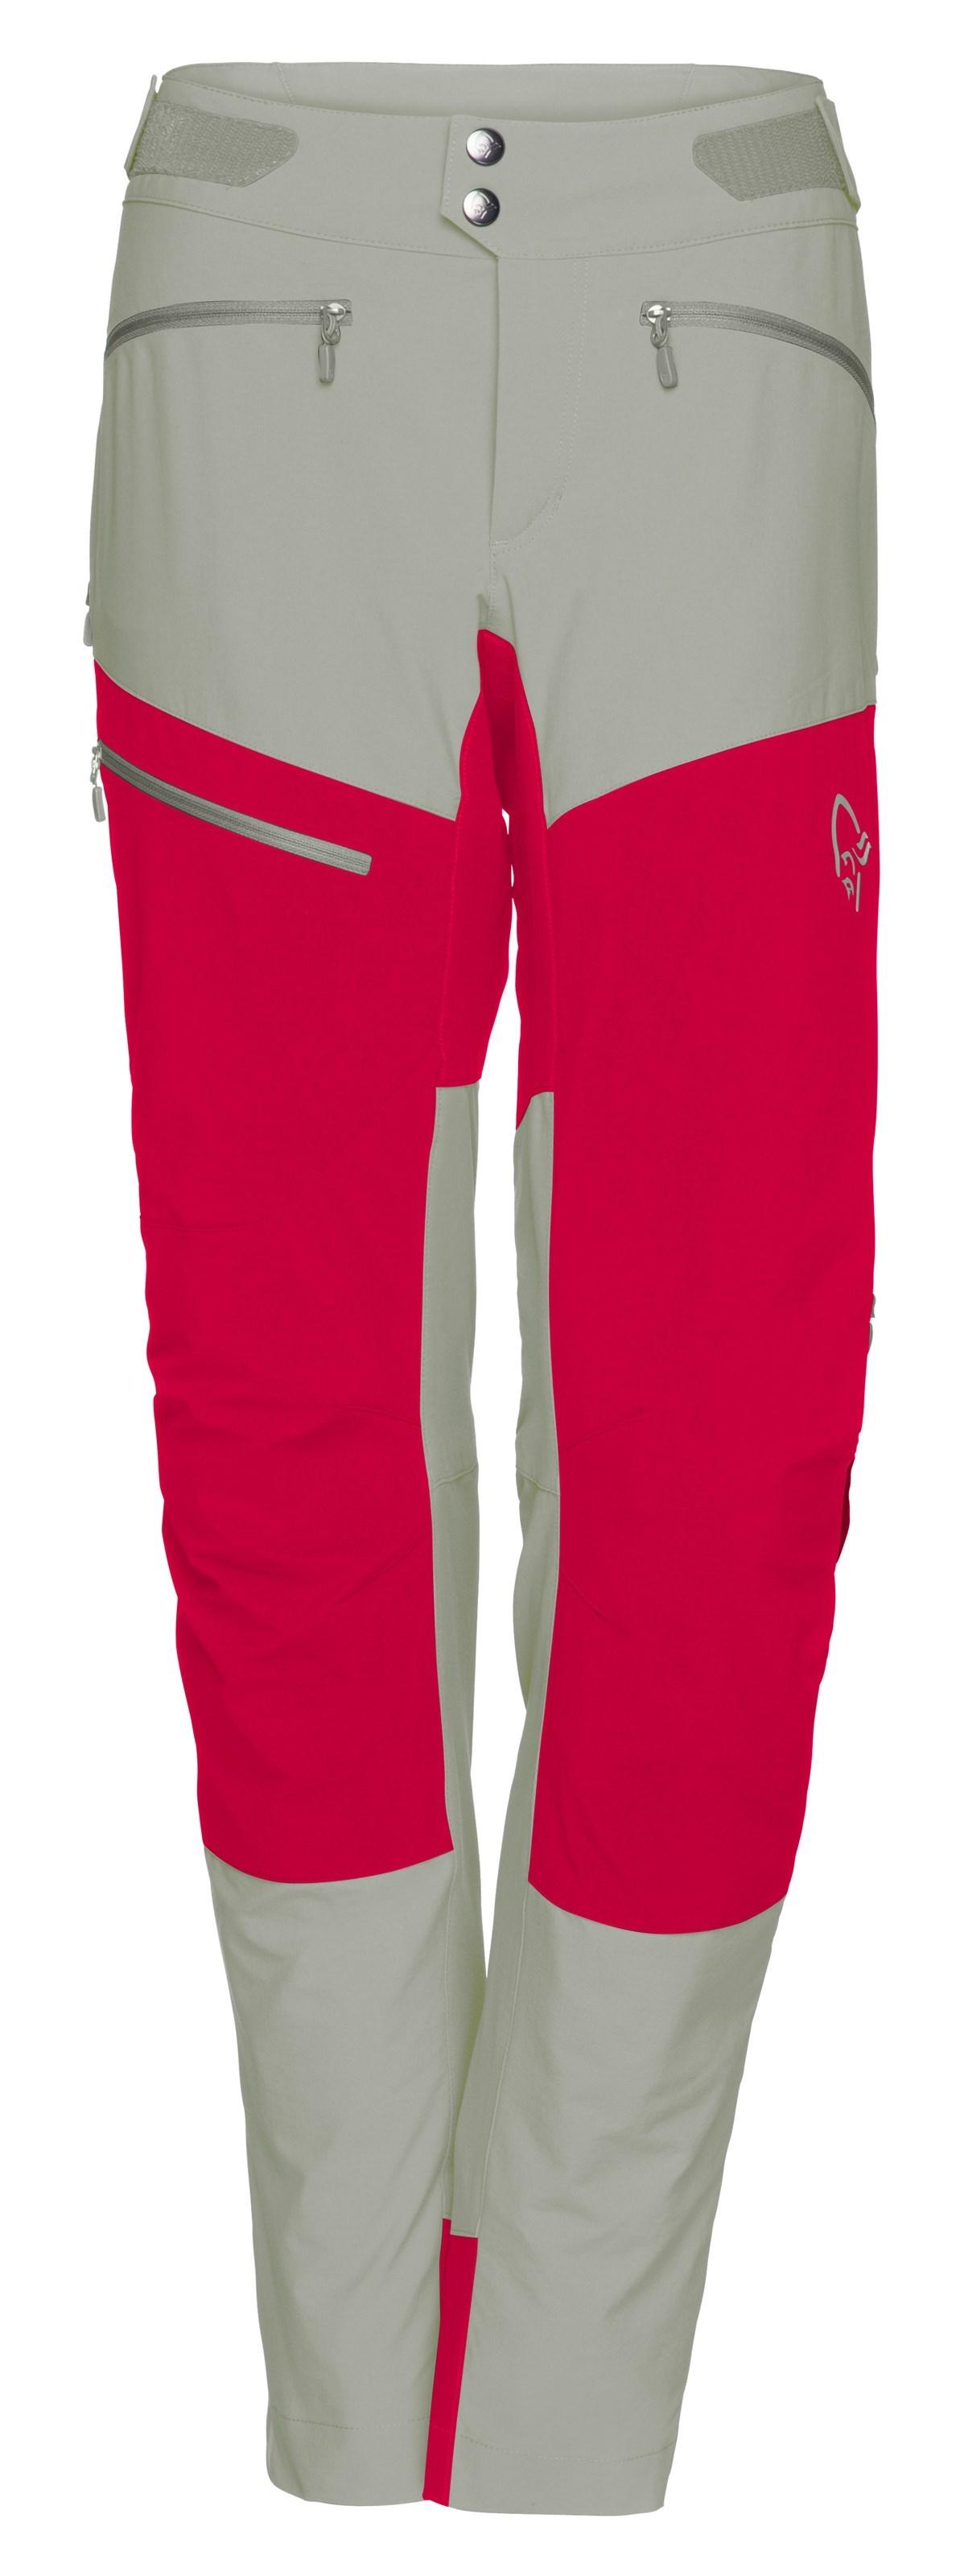 752b690a ... Bilde: Norrøna Fjørå flex1 Pants, softshellbukse dame - Castor  Grey/Jester Red 2224 ...